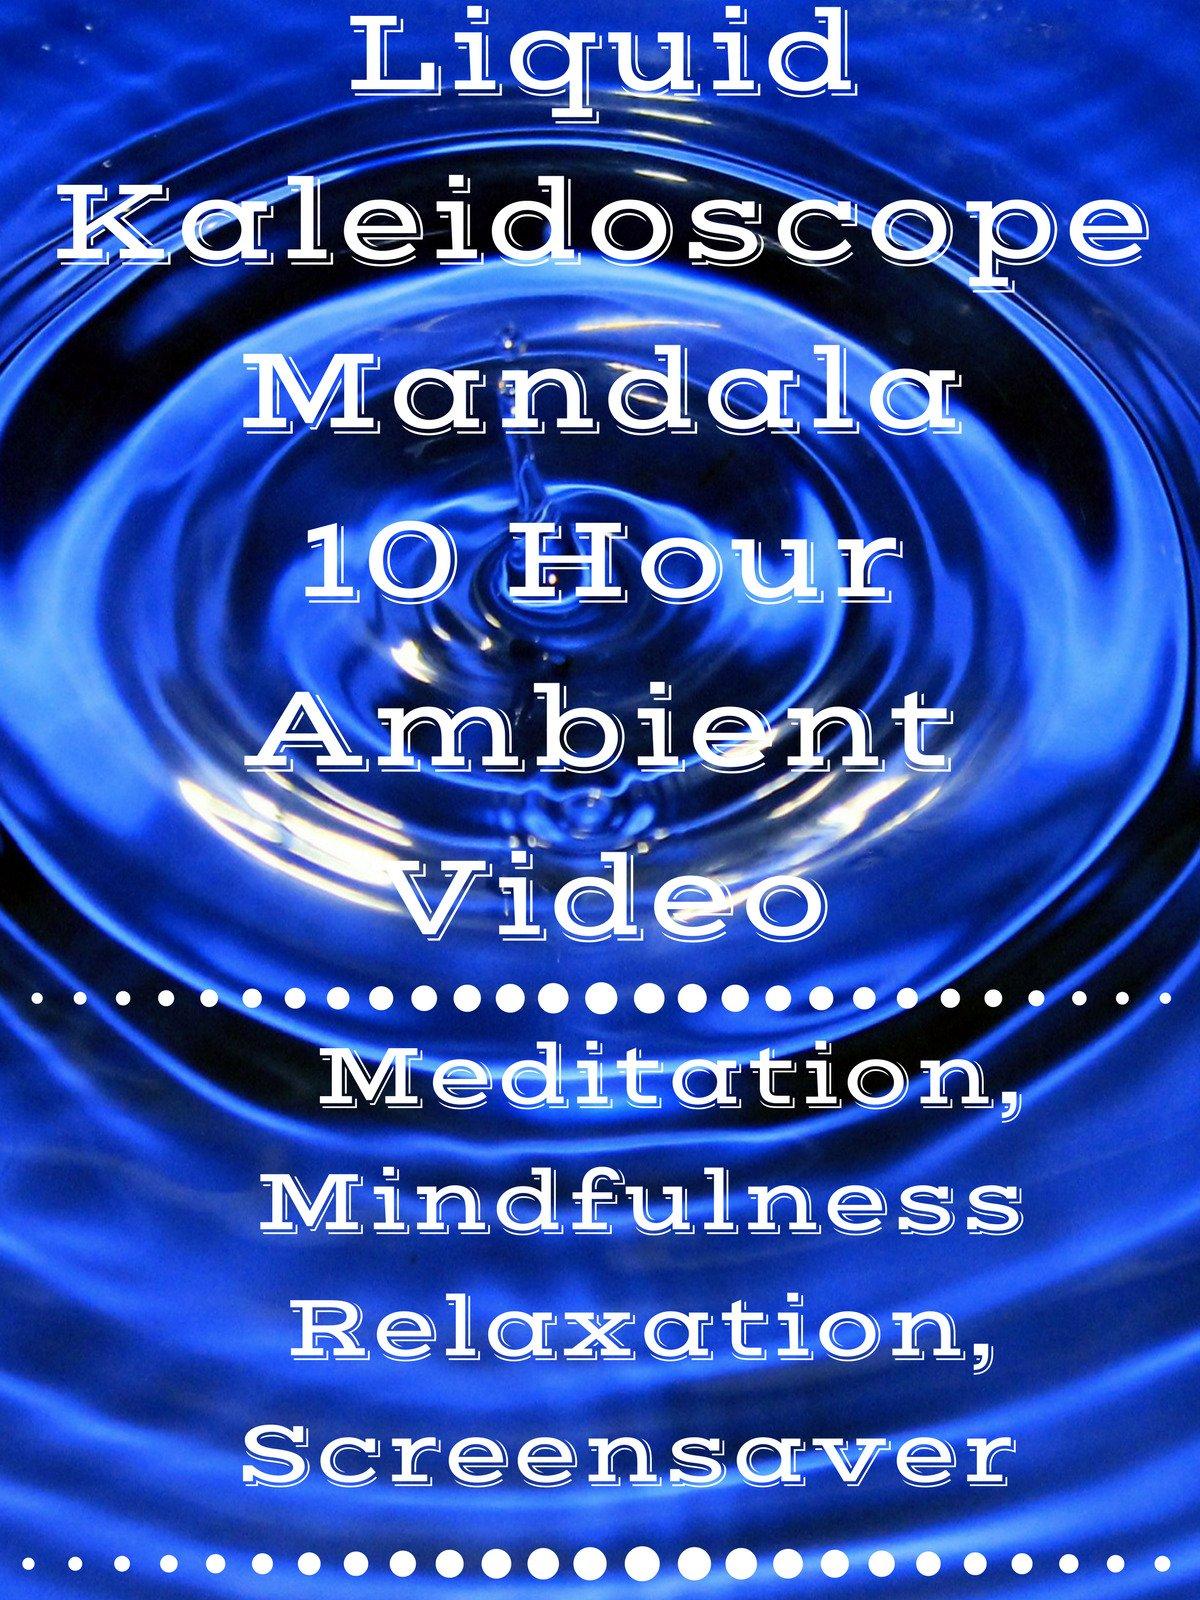 Liquid kaleidoscope mandala 10 hour ambient video meditation mindfulness relaxation screensaver on Amazon Prime Instant Video UK